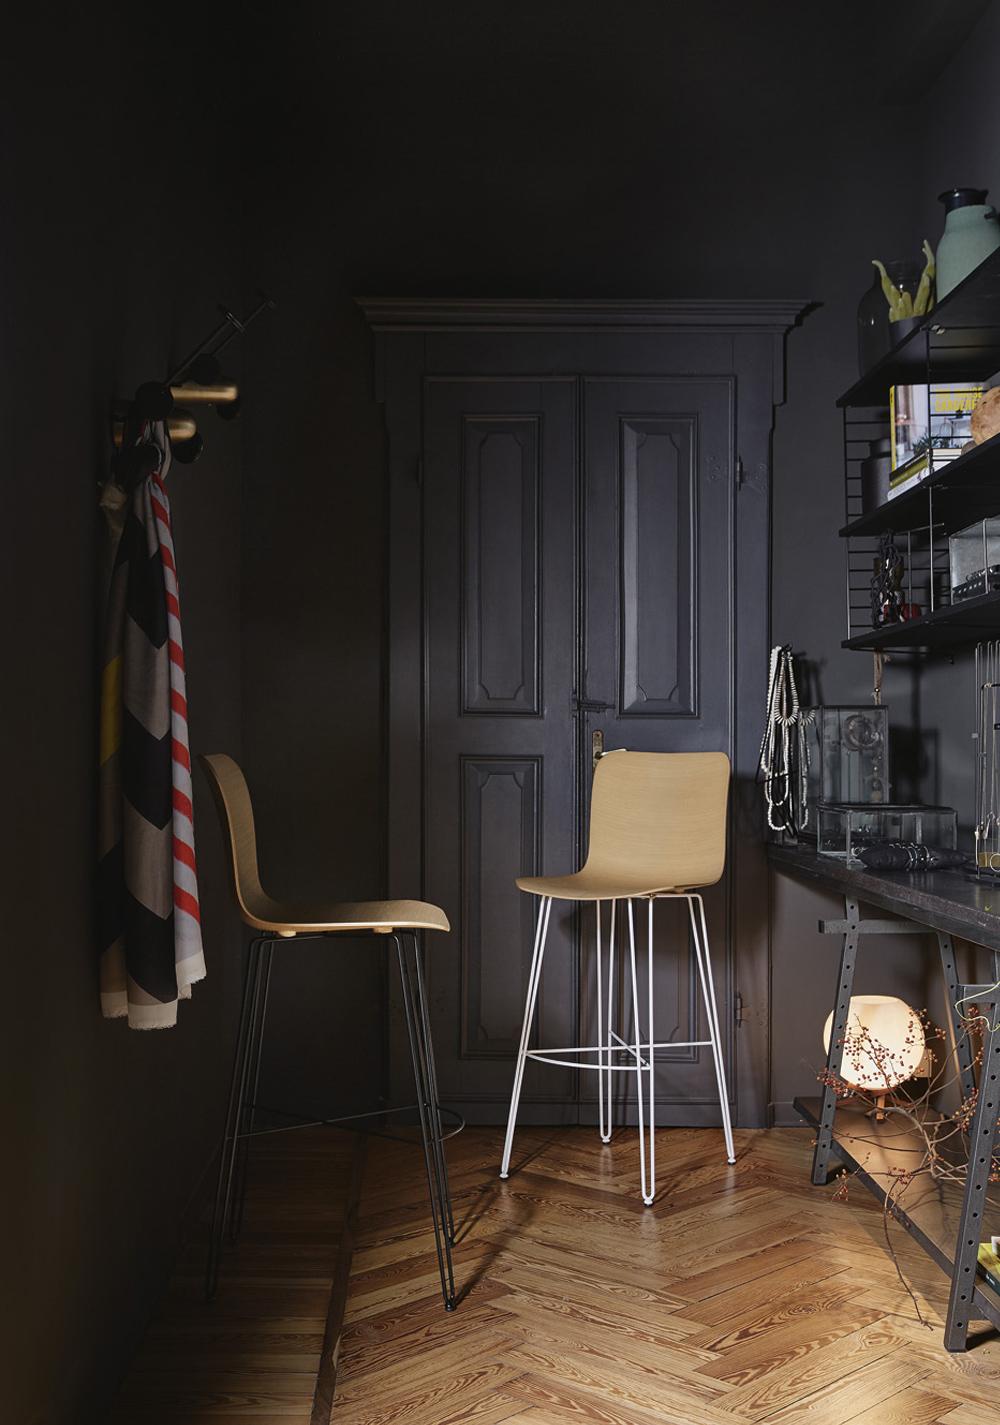 Colico Барный стул Dandy Iron SS от итальянского бренда Colico